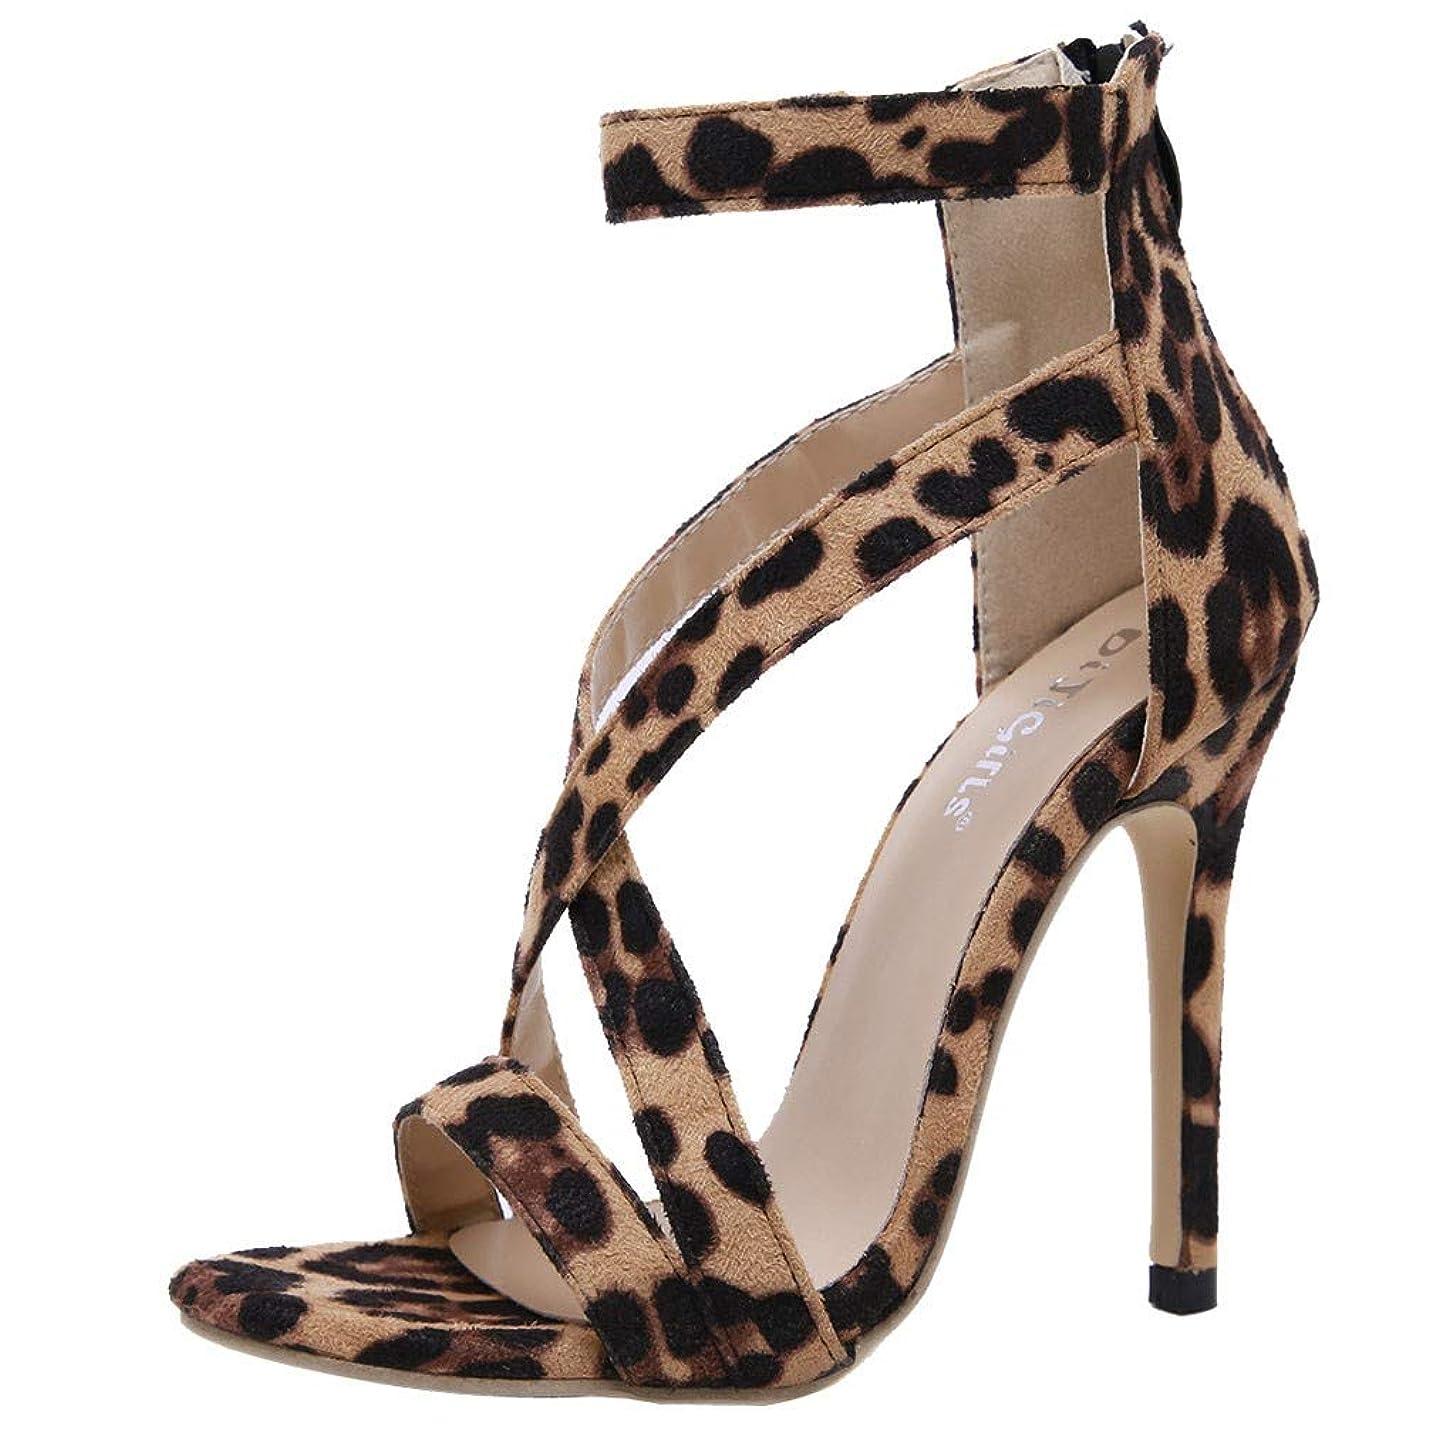 Women Wild Leopard Print Stiletto High Heel D'Orsay Dress Shoes Fashion Ankle Strap Block Dress Sandals JHKUNO